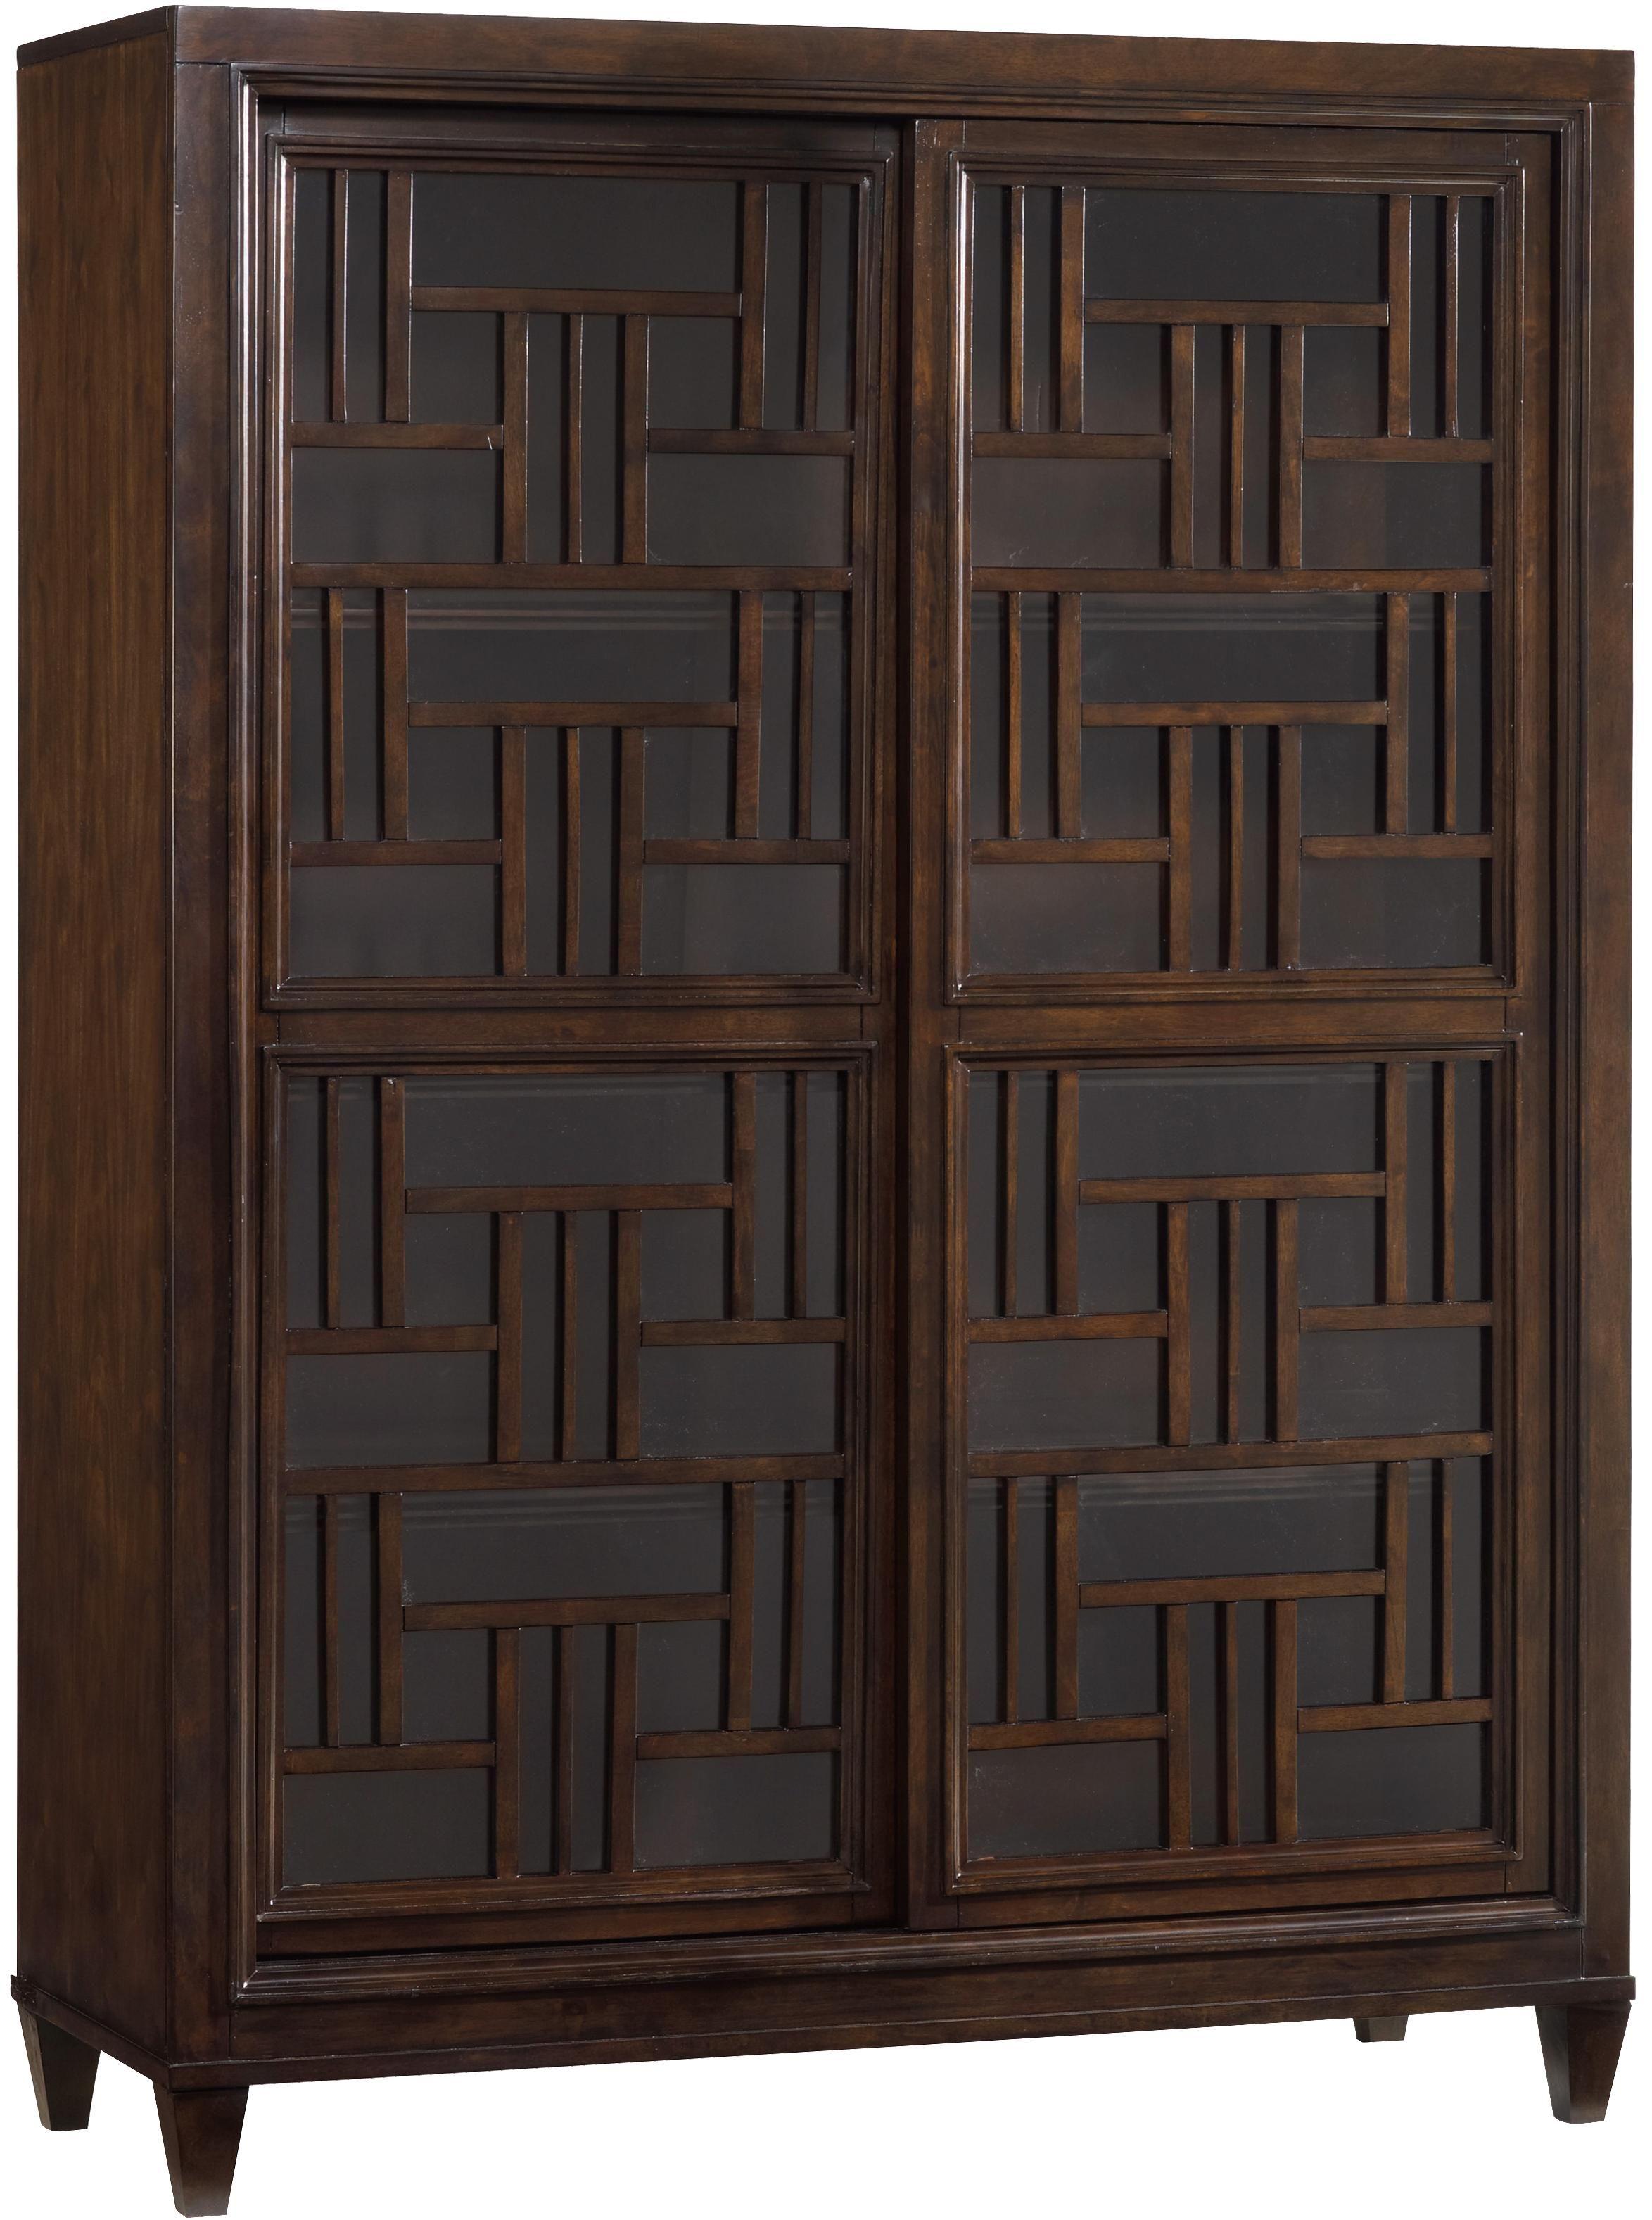 1457 Main Ludlow Bunching Bookcase With Two Sliding Glass Doors U0026  Decorative Fretwork   Furniture Barn